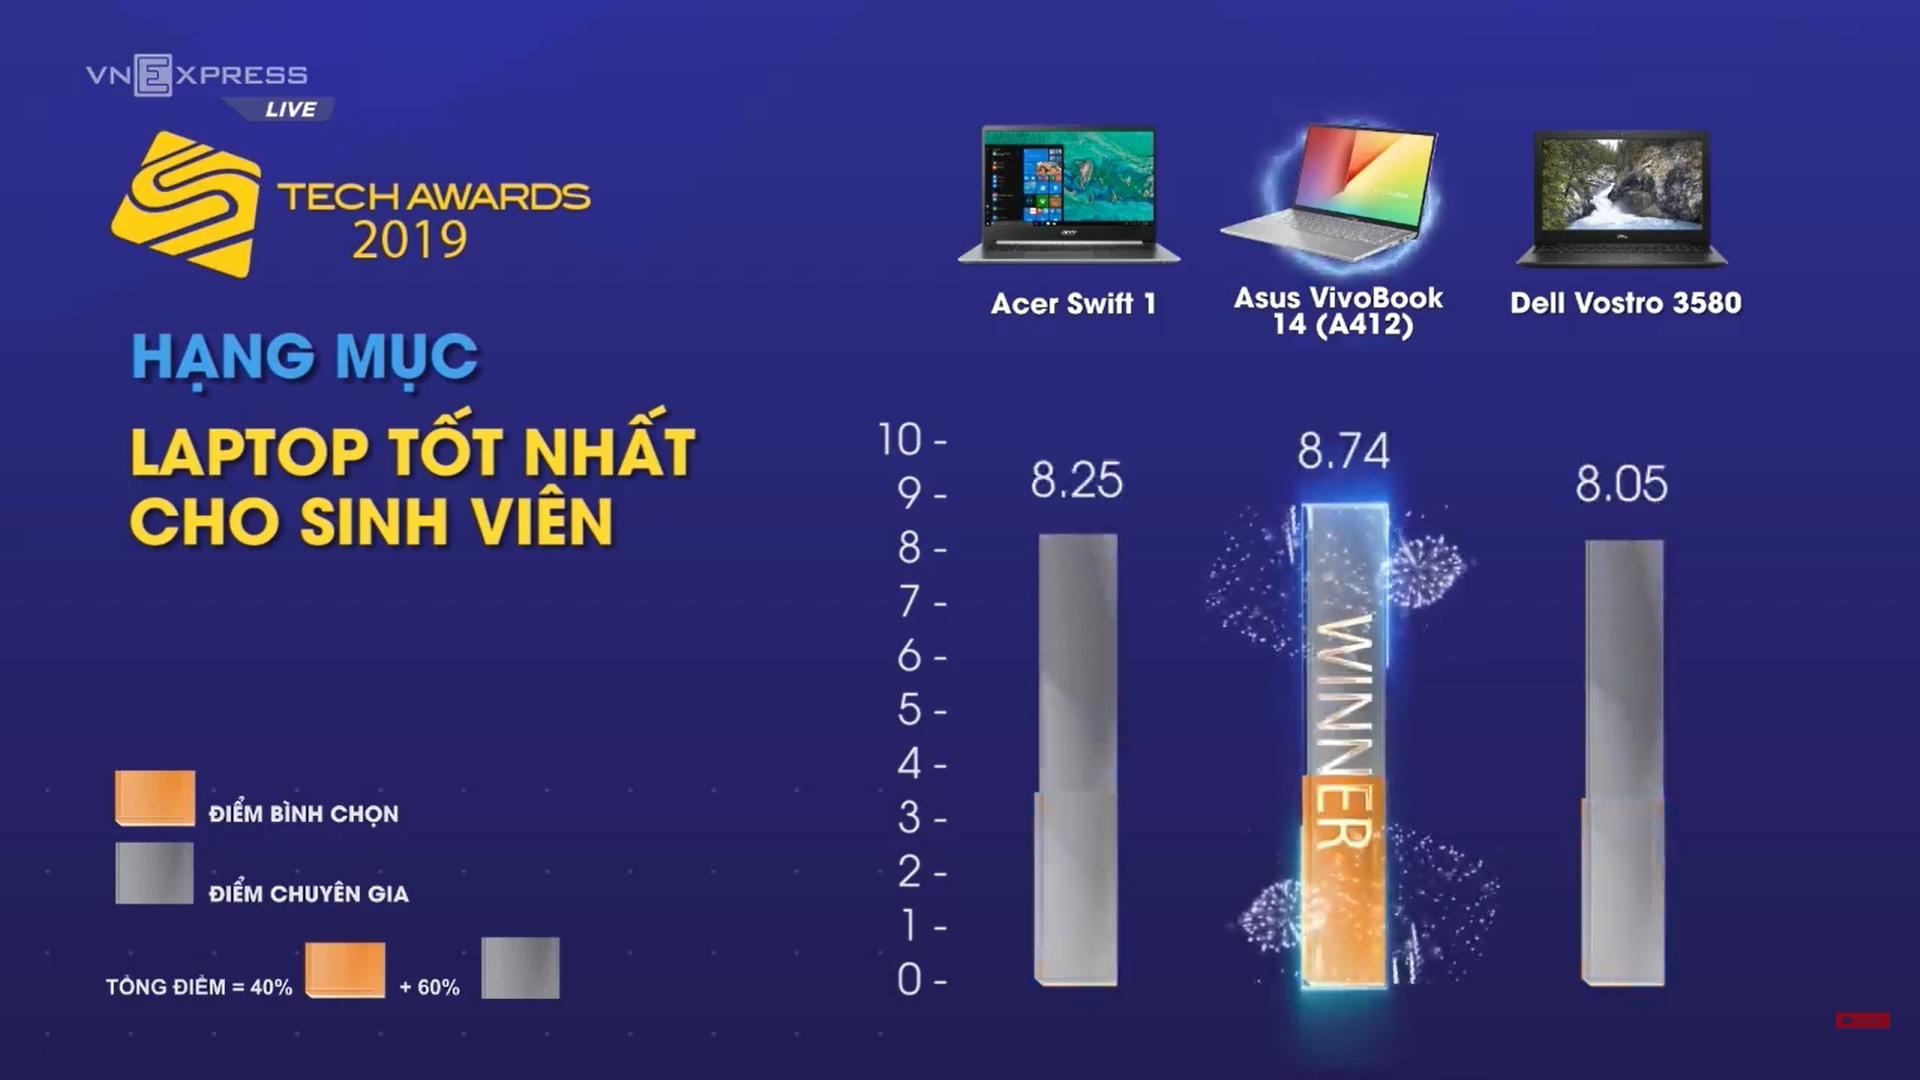 tech-award-2019_1-jpg.9302